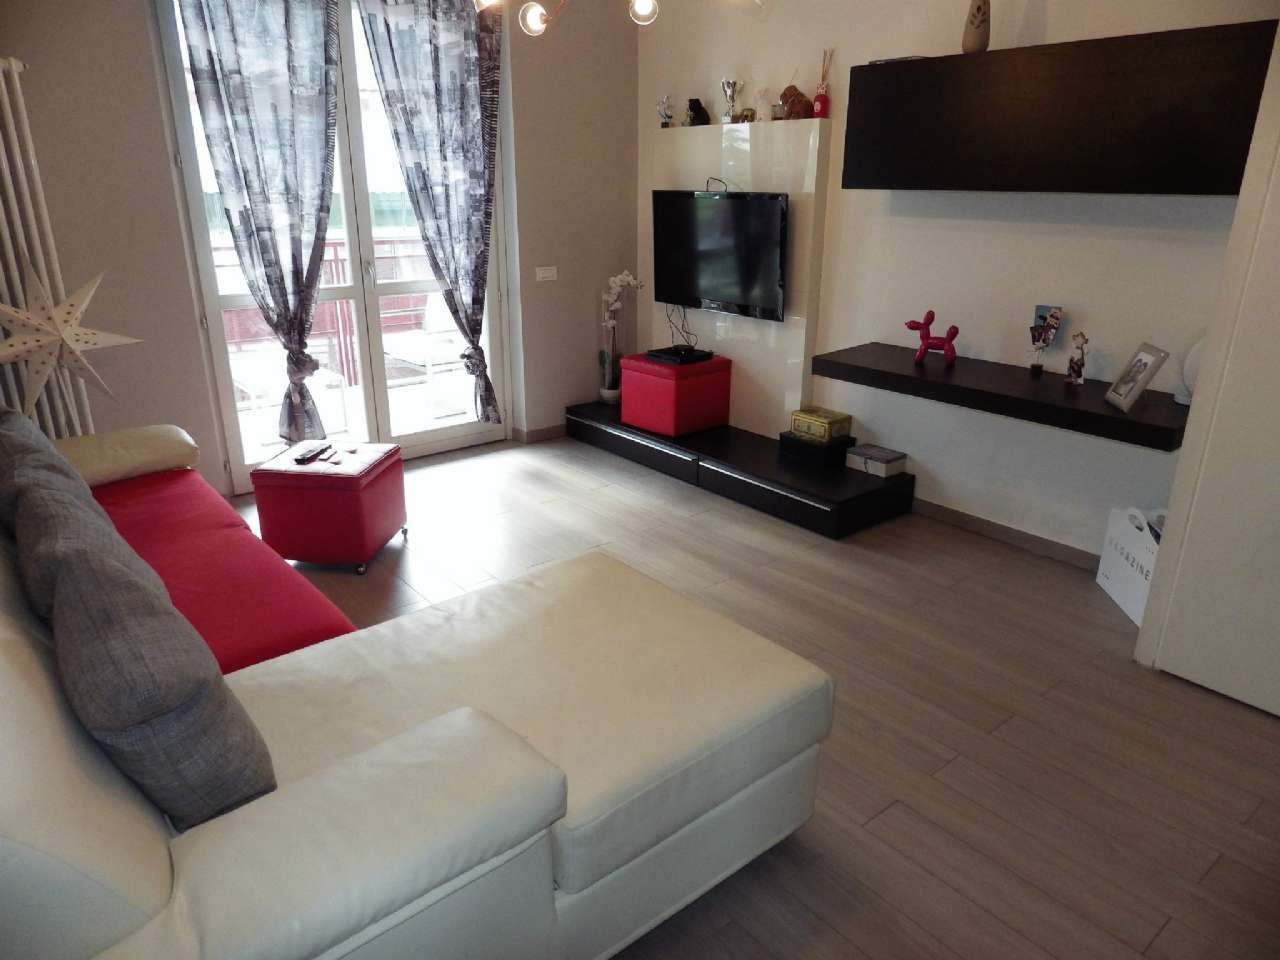 Foto 1 di Appartamento Via De Andrè, Grugliasco